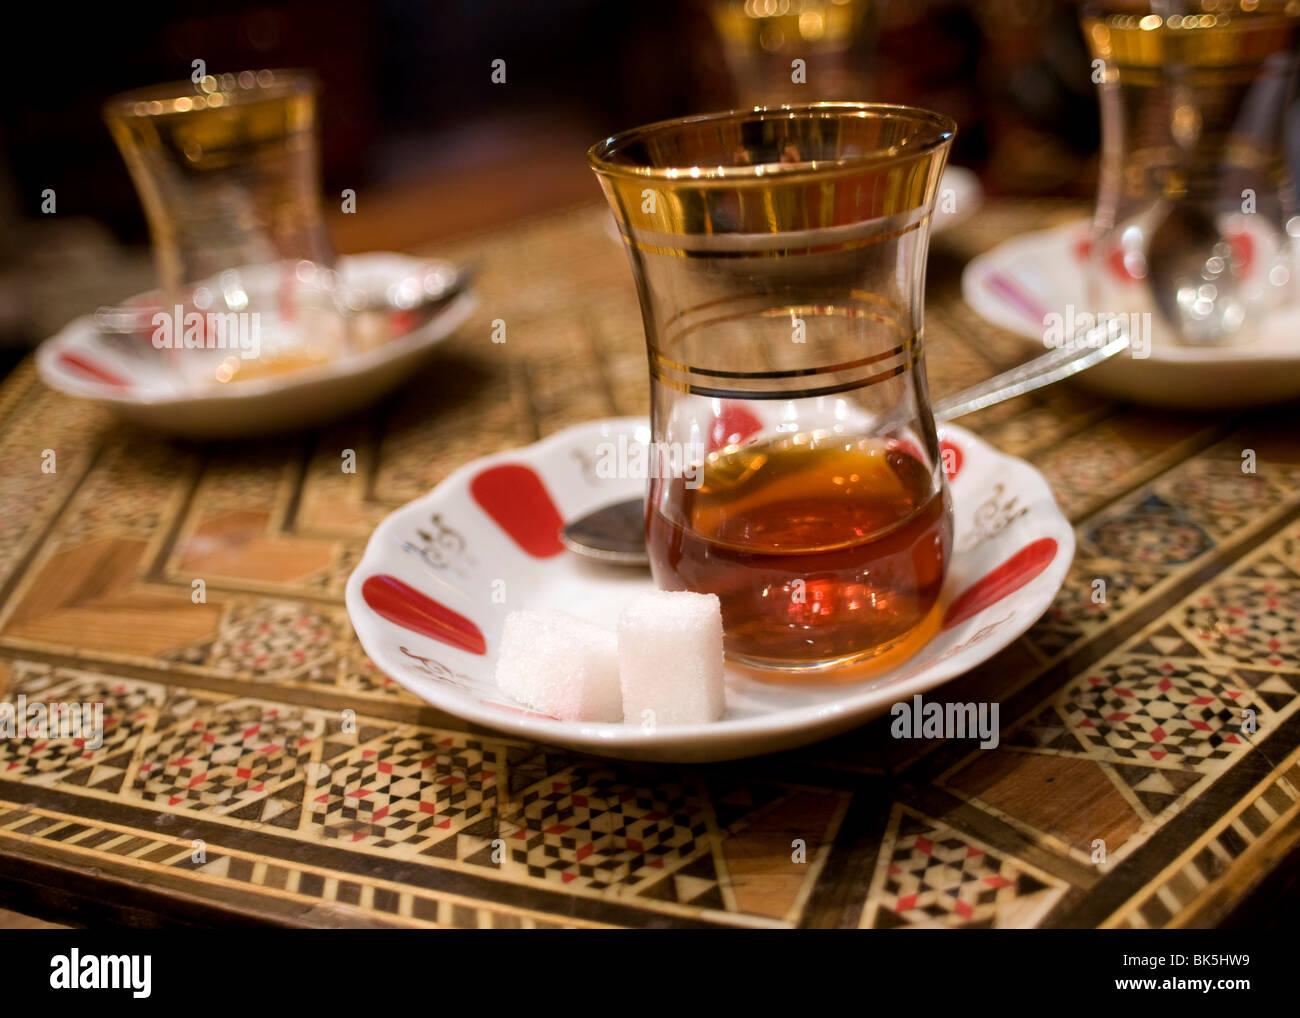 Glasses of traditional Turkish tea, Istanbul, Turkey - Stock Image